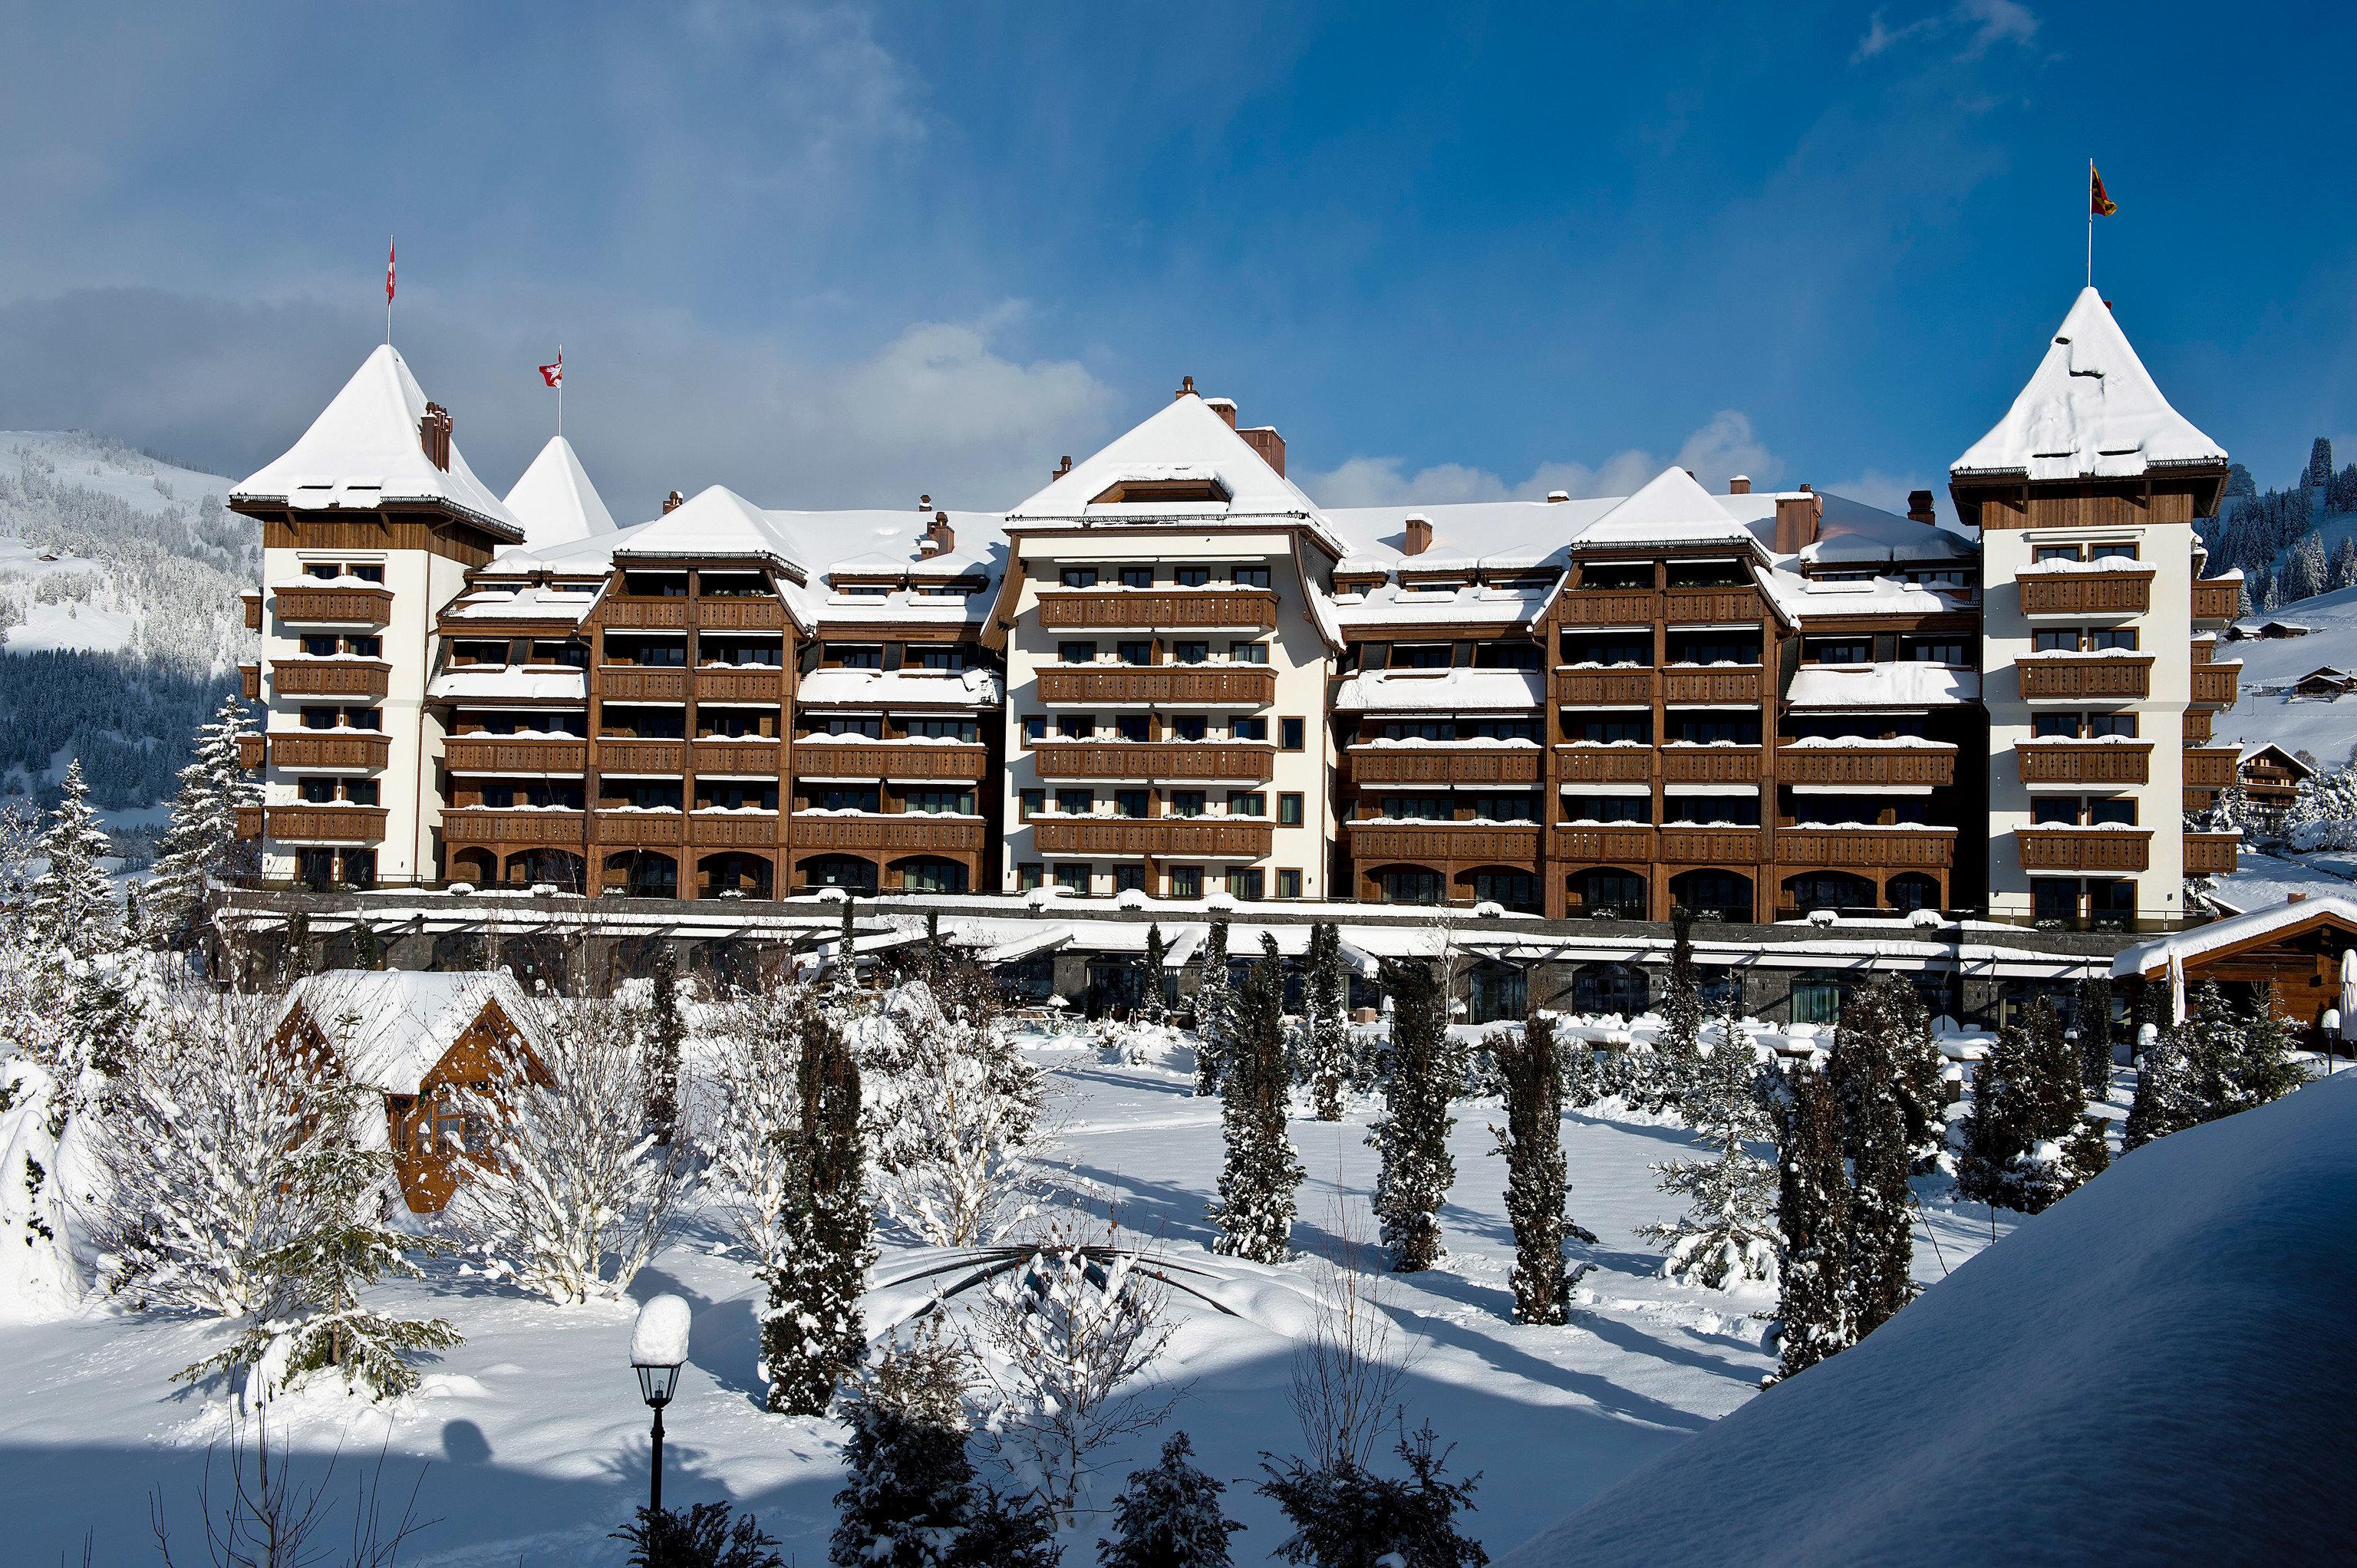 snow sky Winter weather Resort season Nature mountain place of worship